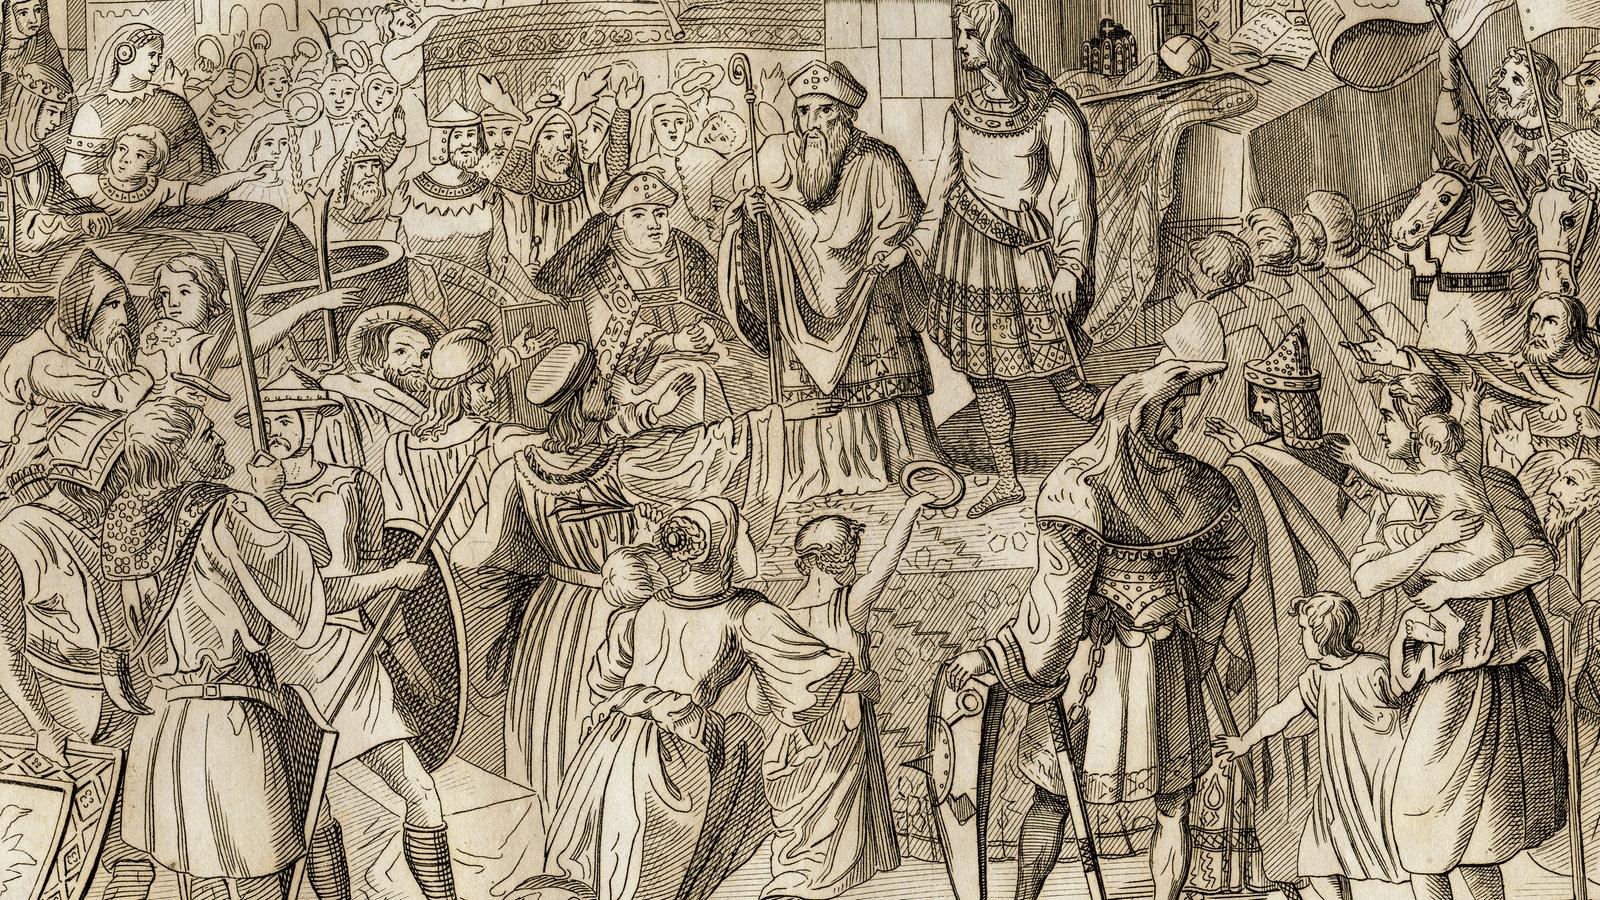 Mittelalter Leben Im Mittelalter Mittelalter